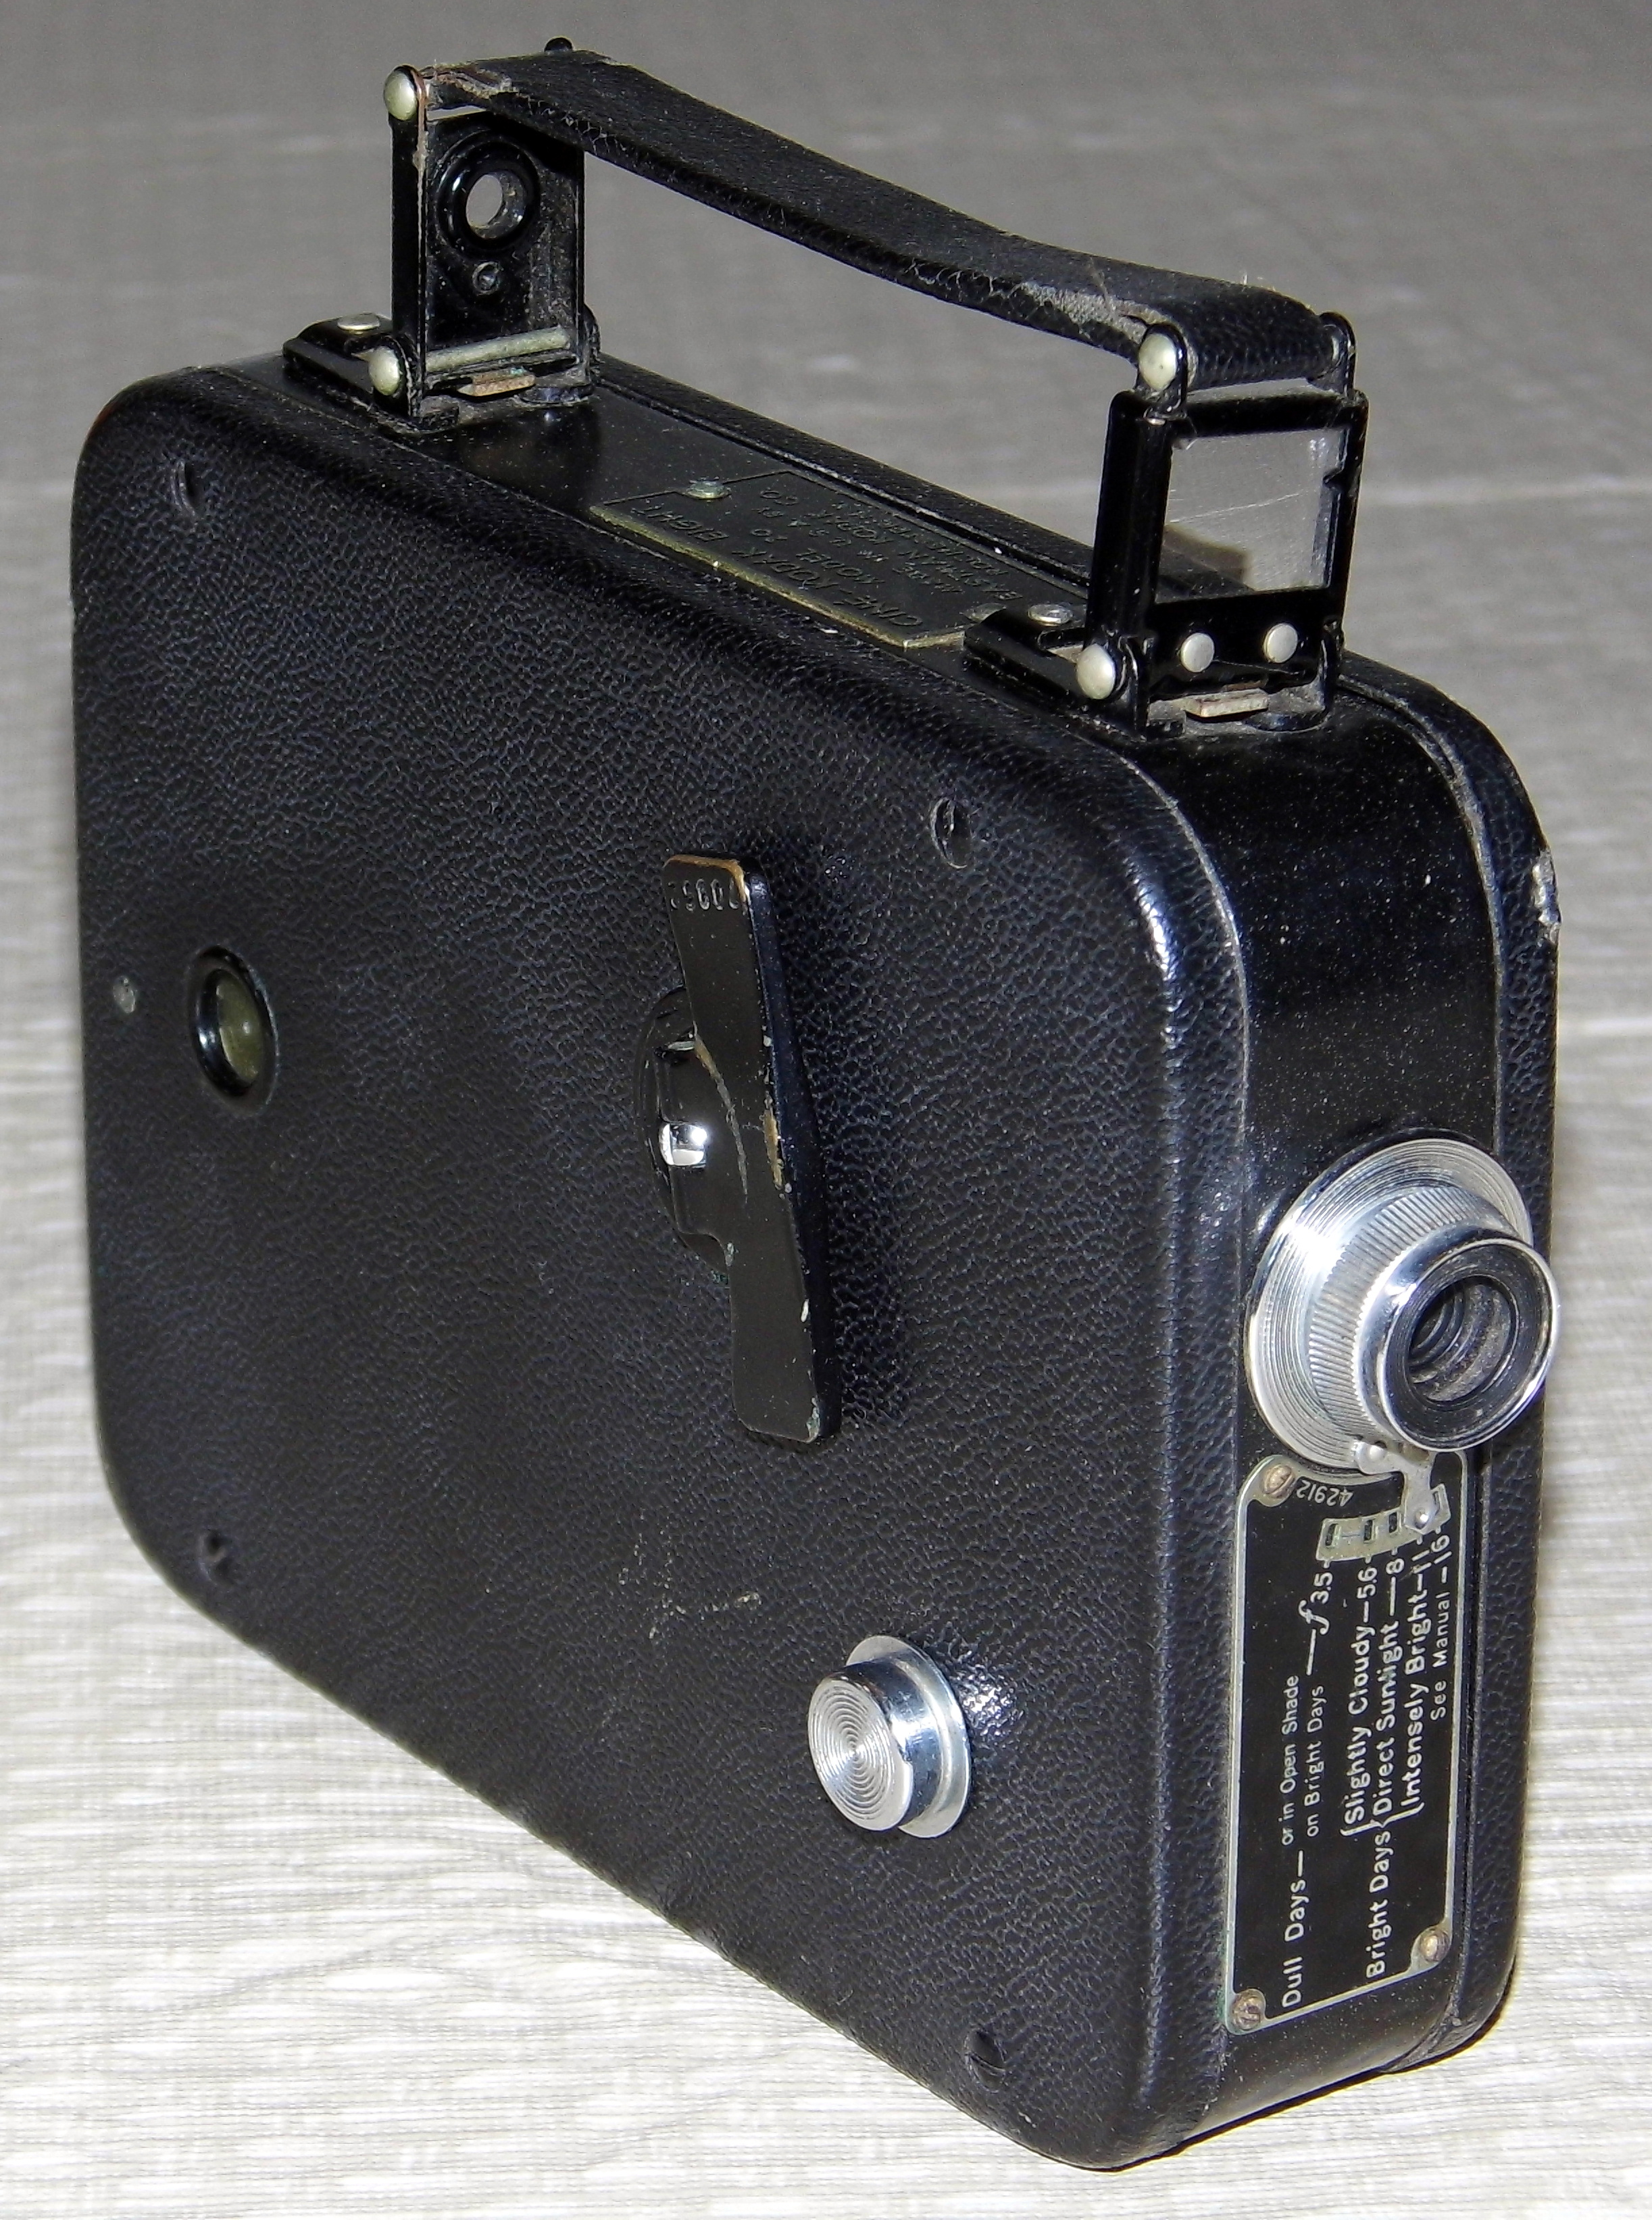 file vintage kodak cine kodak eight model 20 8mm movie camera rh commons wikimedia org Original Cine-Kodak Model Largest Cine-Kodak